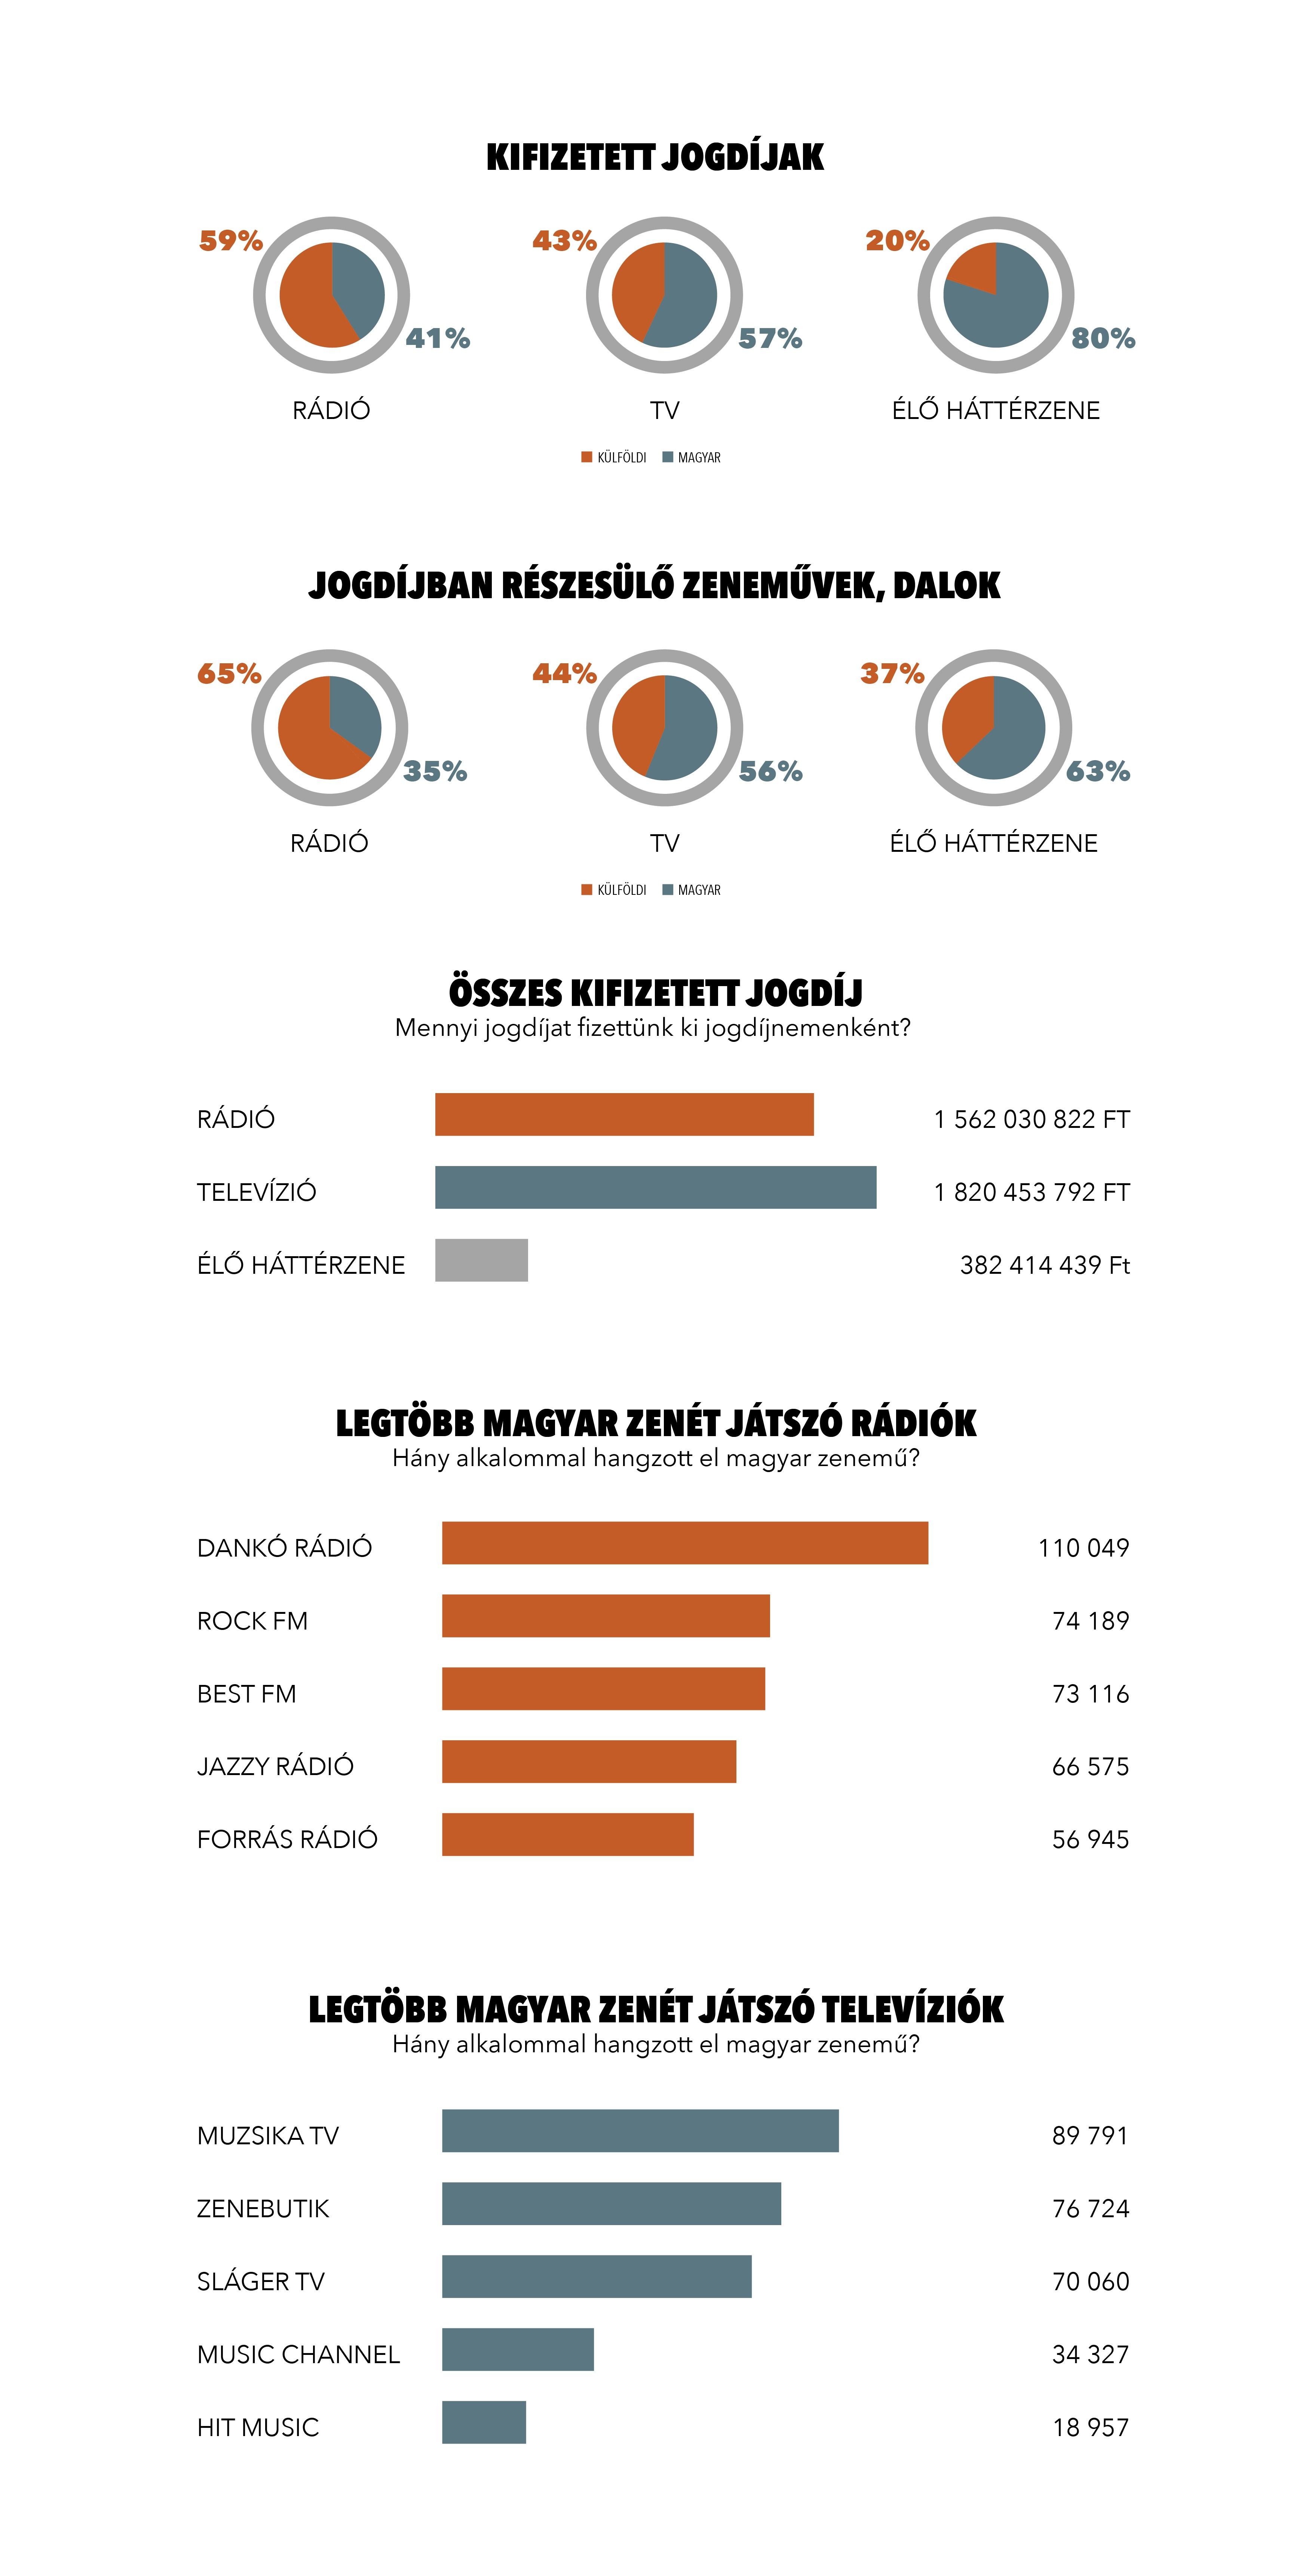 Emelkedtek a TV-s jogdíjak - Média - Mediapiac com